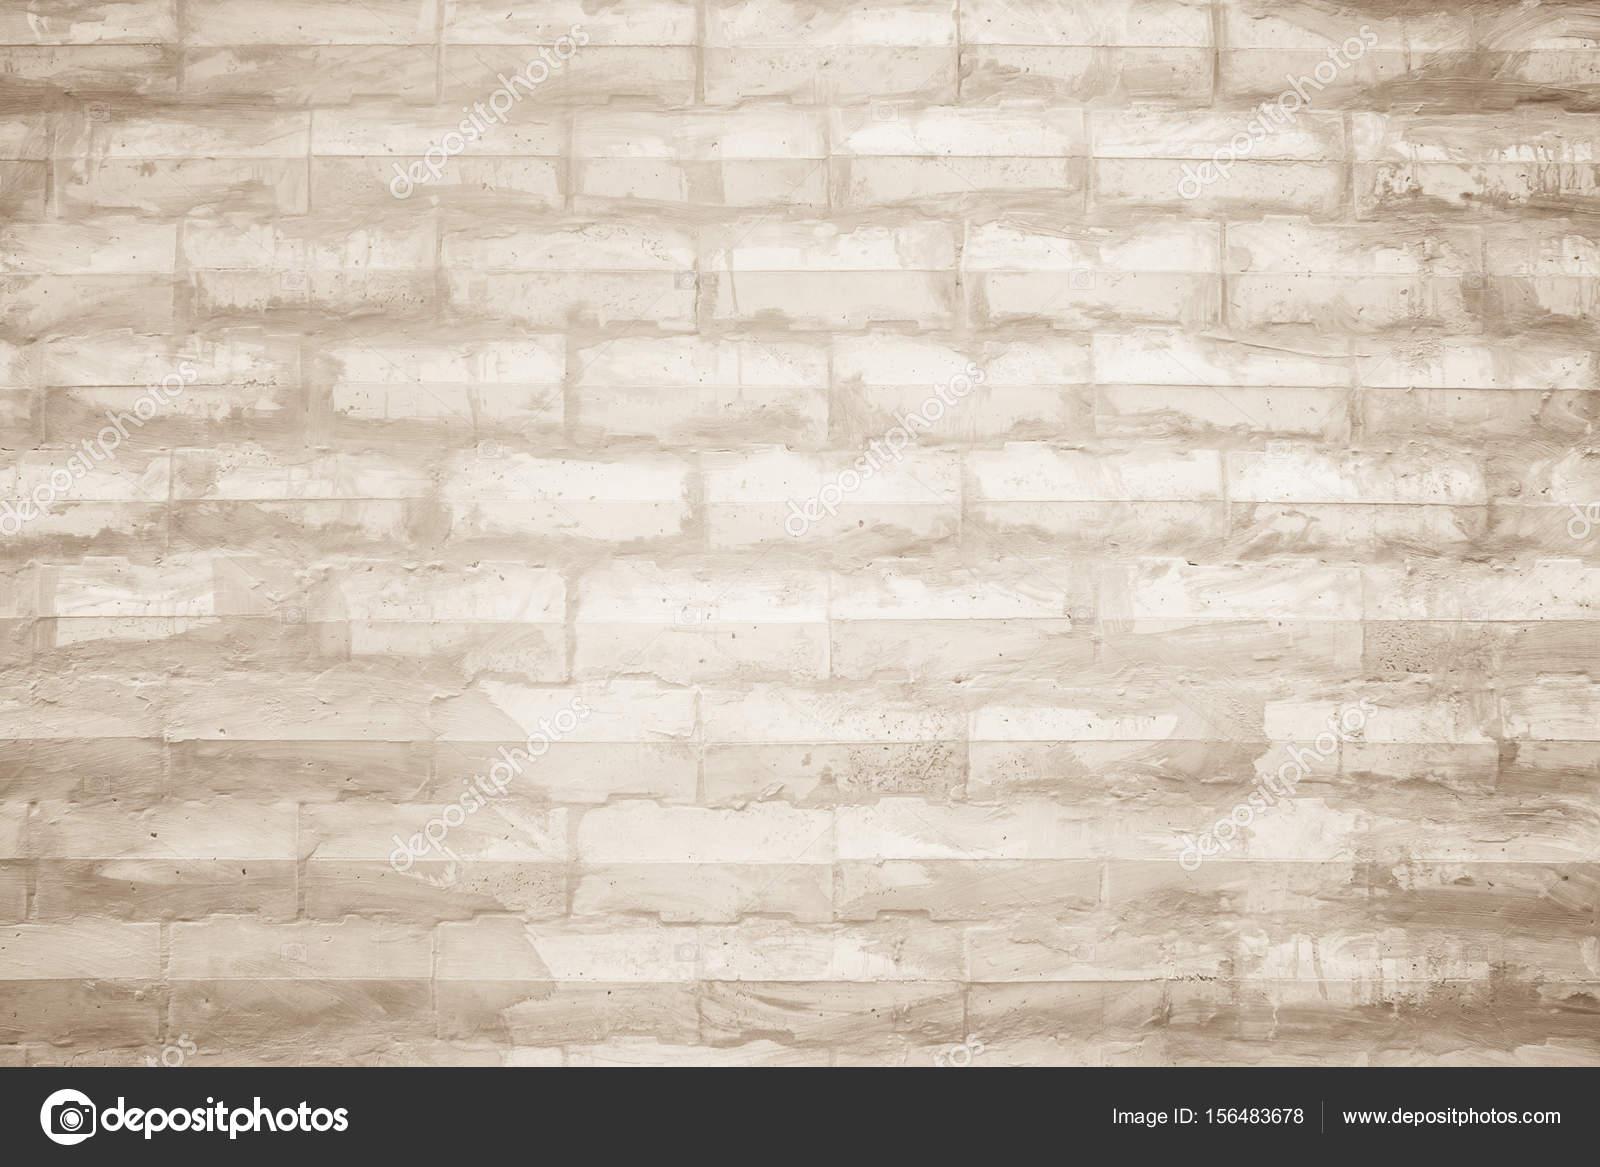 Black White Brick Wall Texture Background Have Flooring Rock